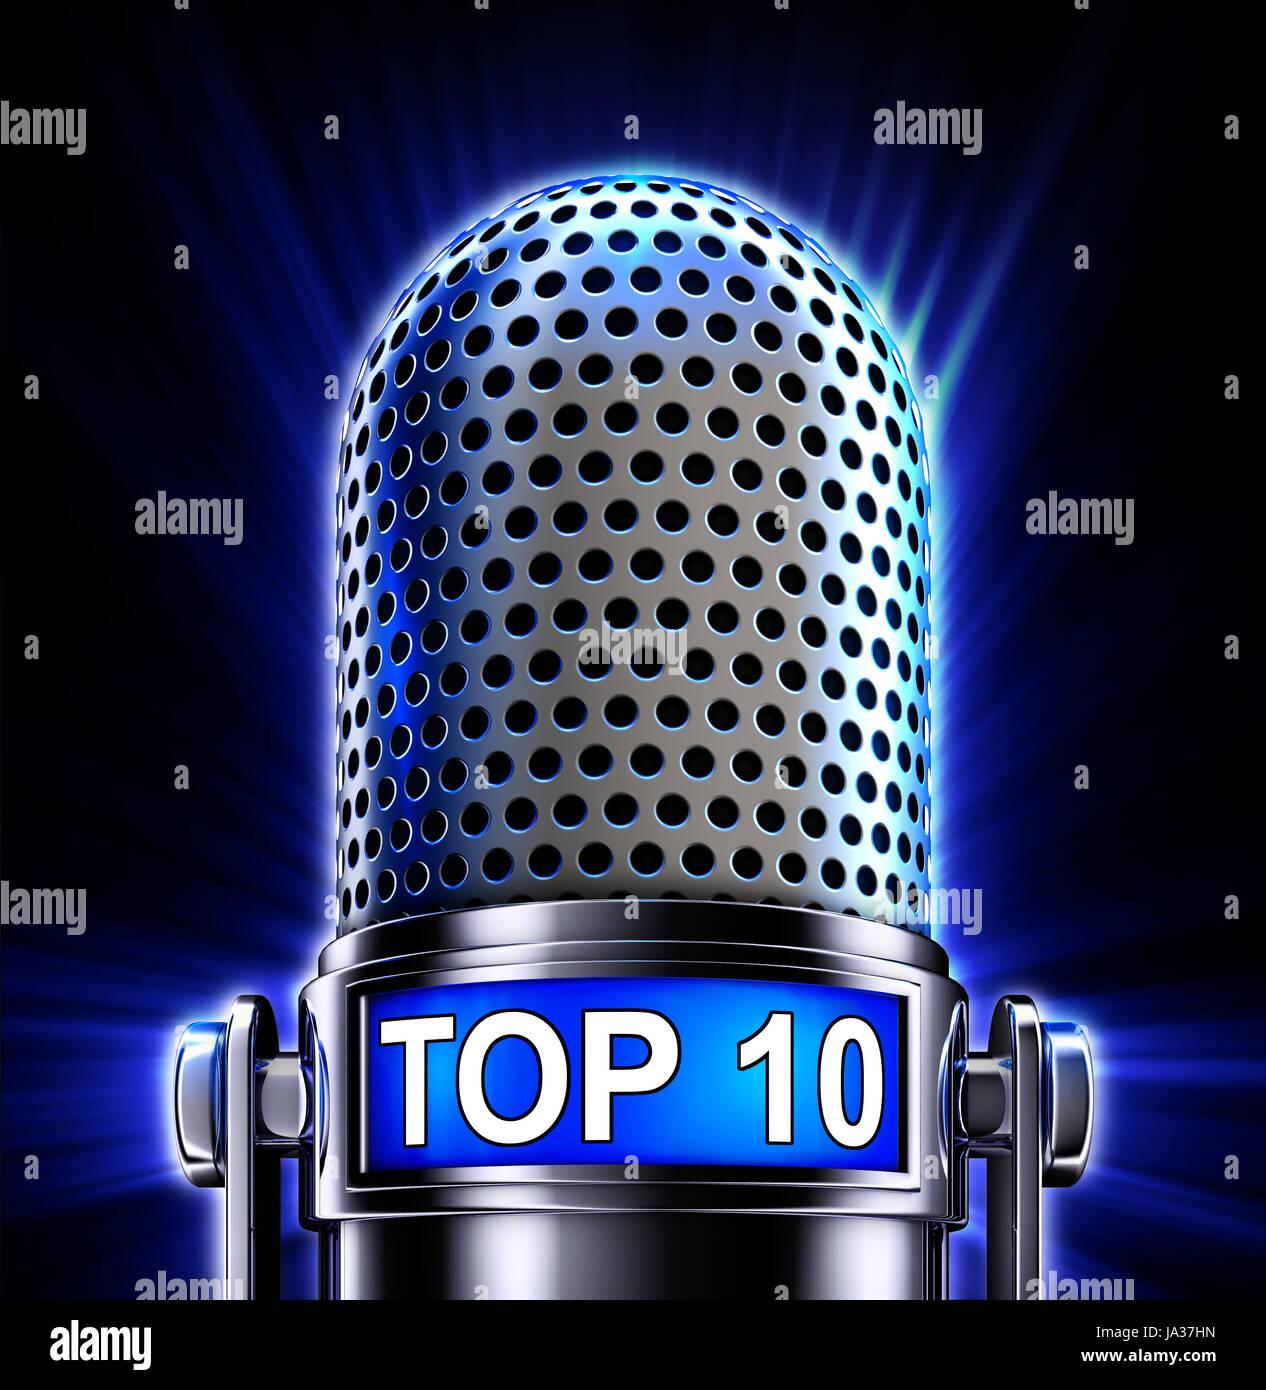 radio, microphone, shipment, broadcast, sign, signal, talk, speaking, speaks, Stock Photo